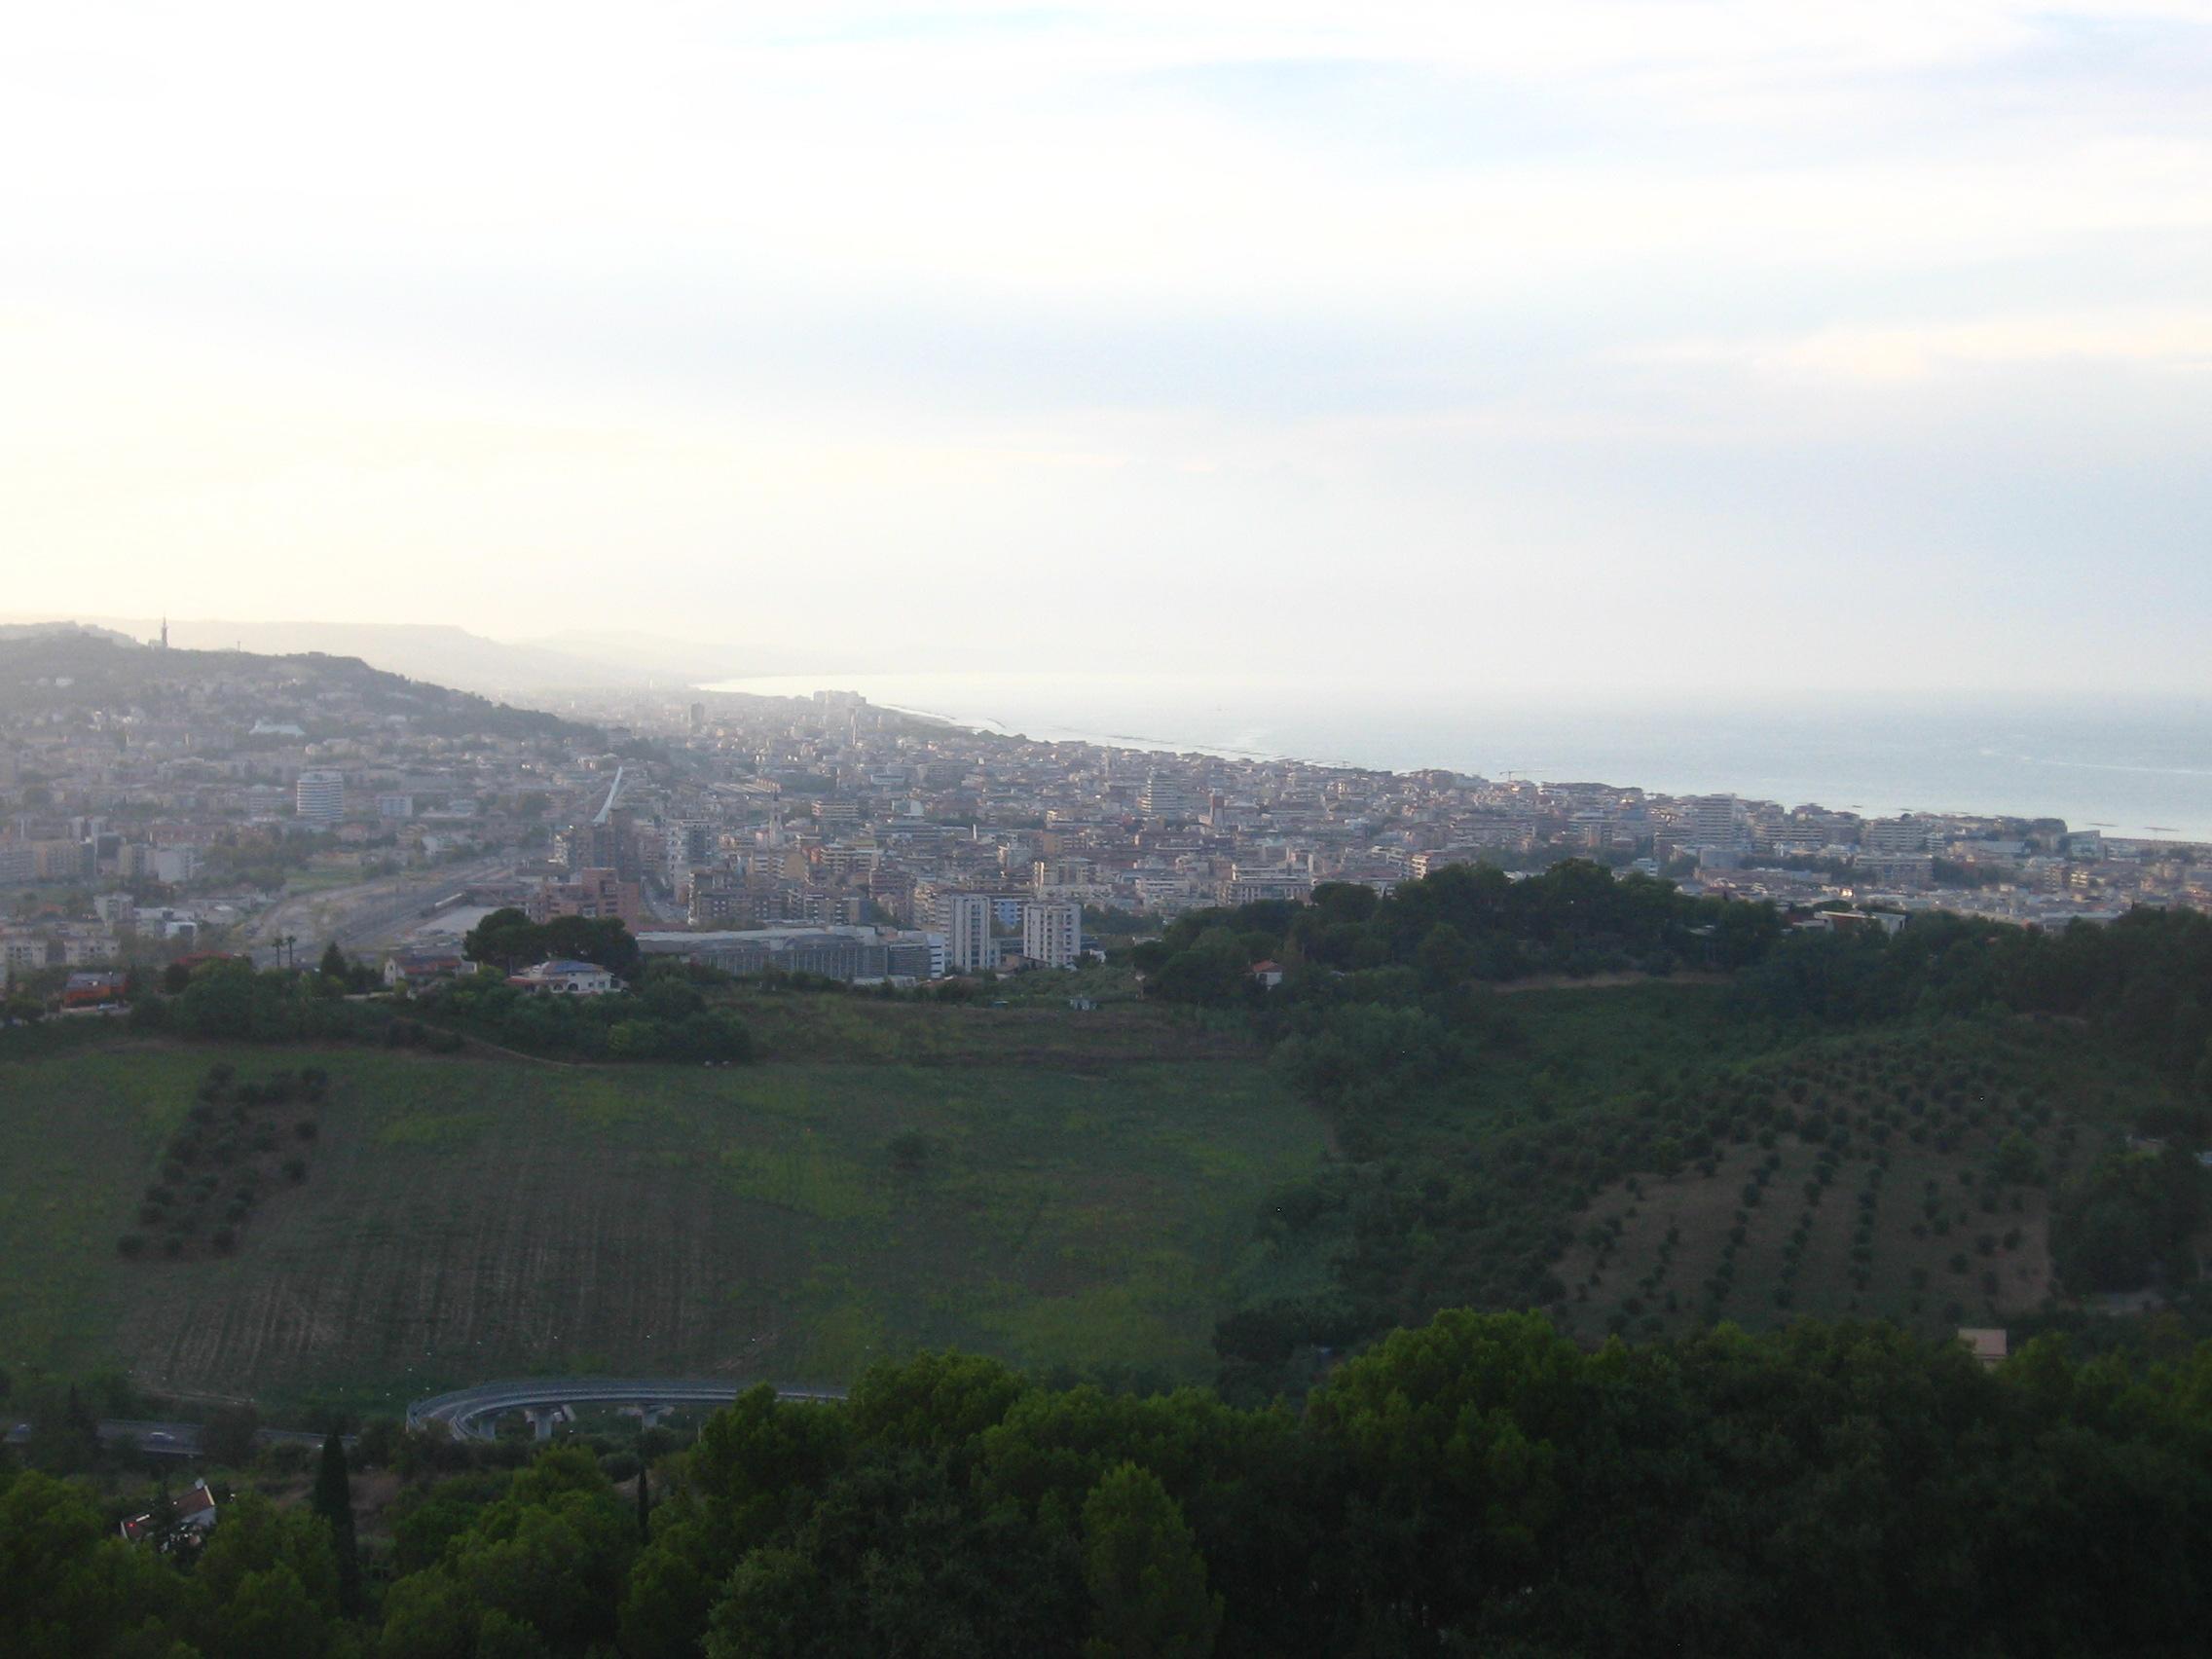 Webcam Pescara: View over Pescara